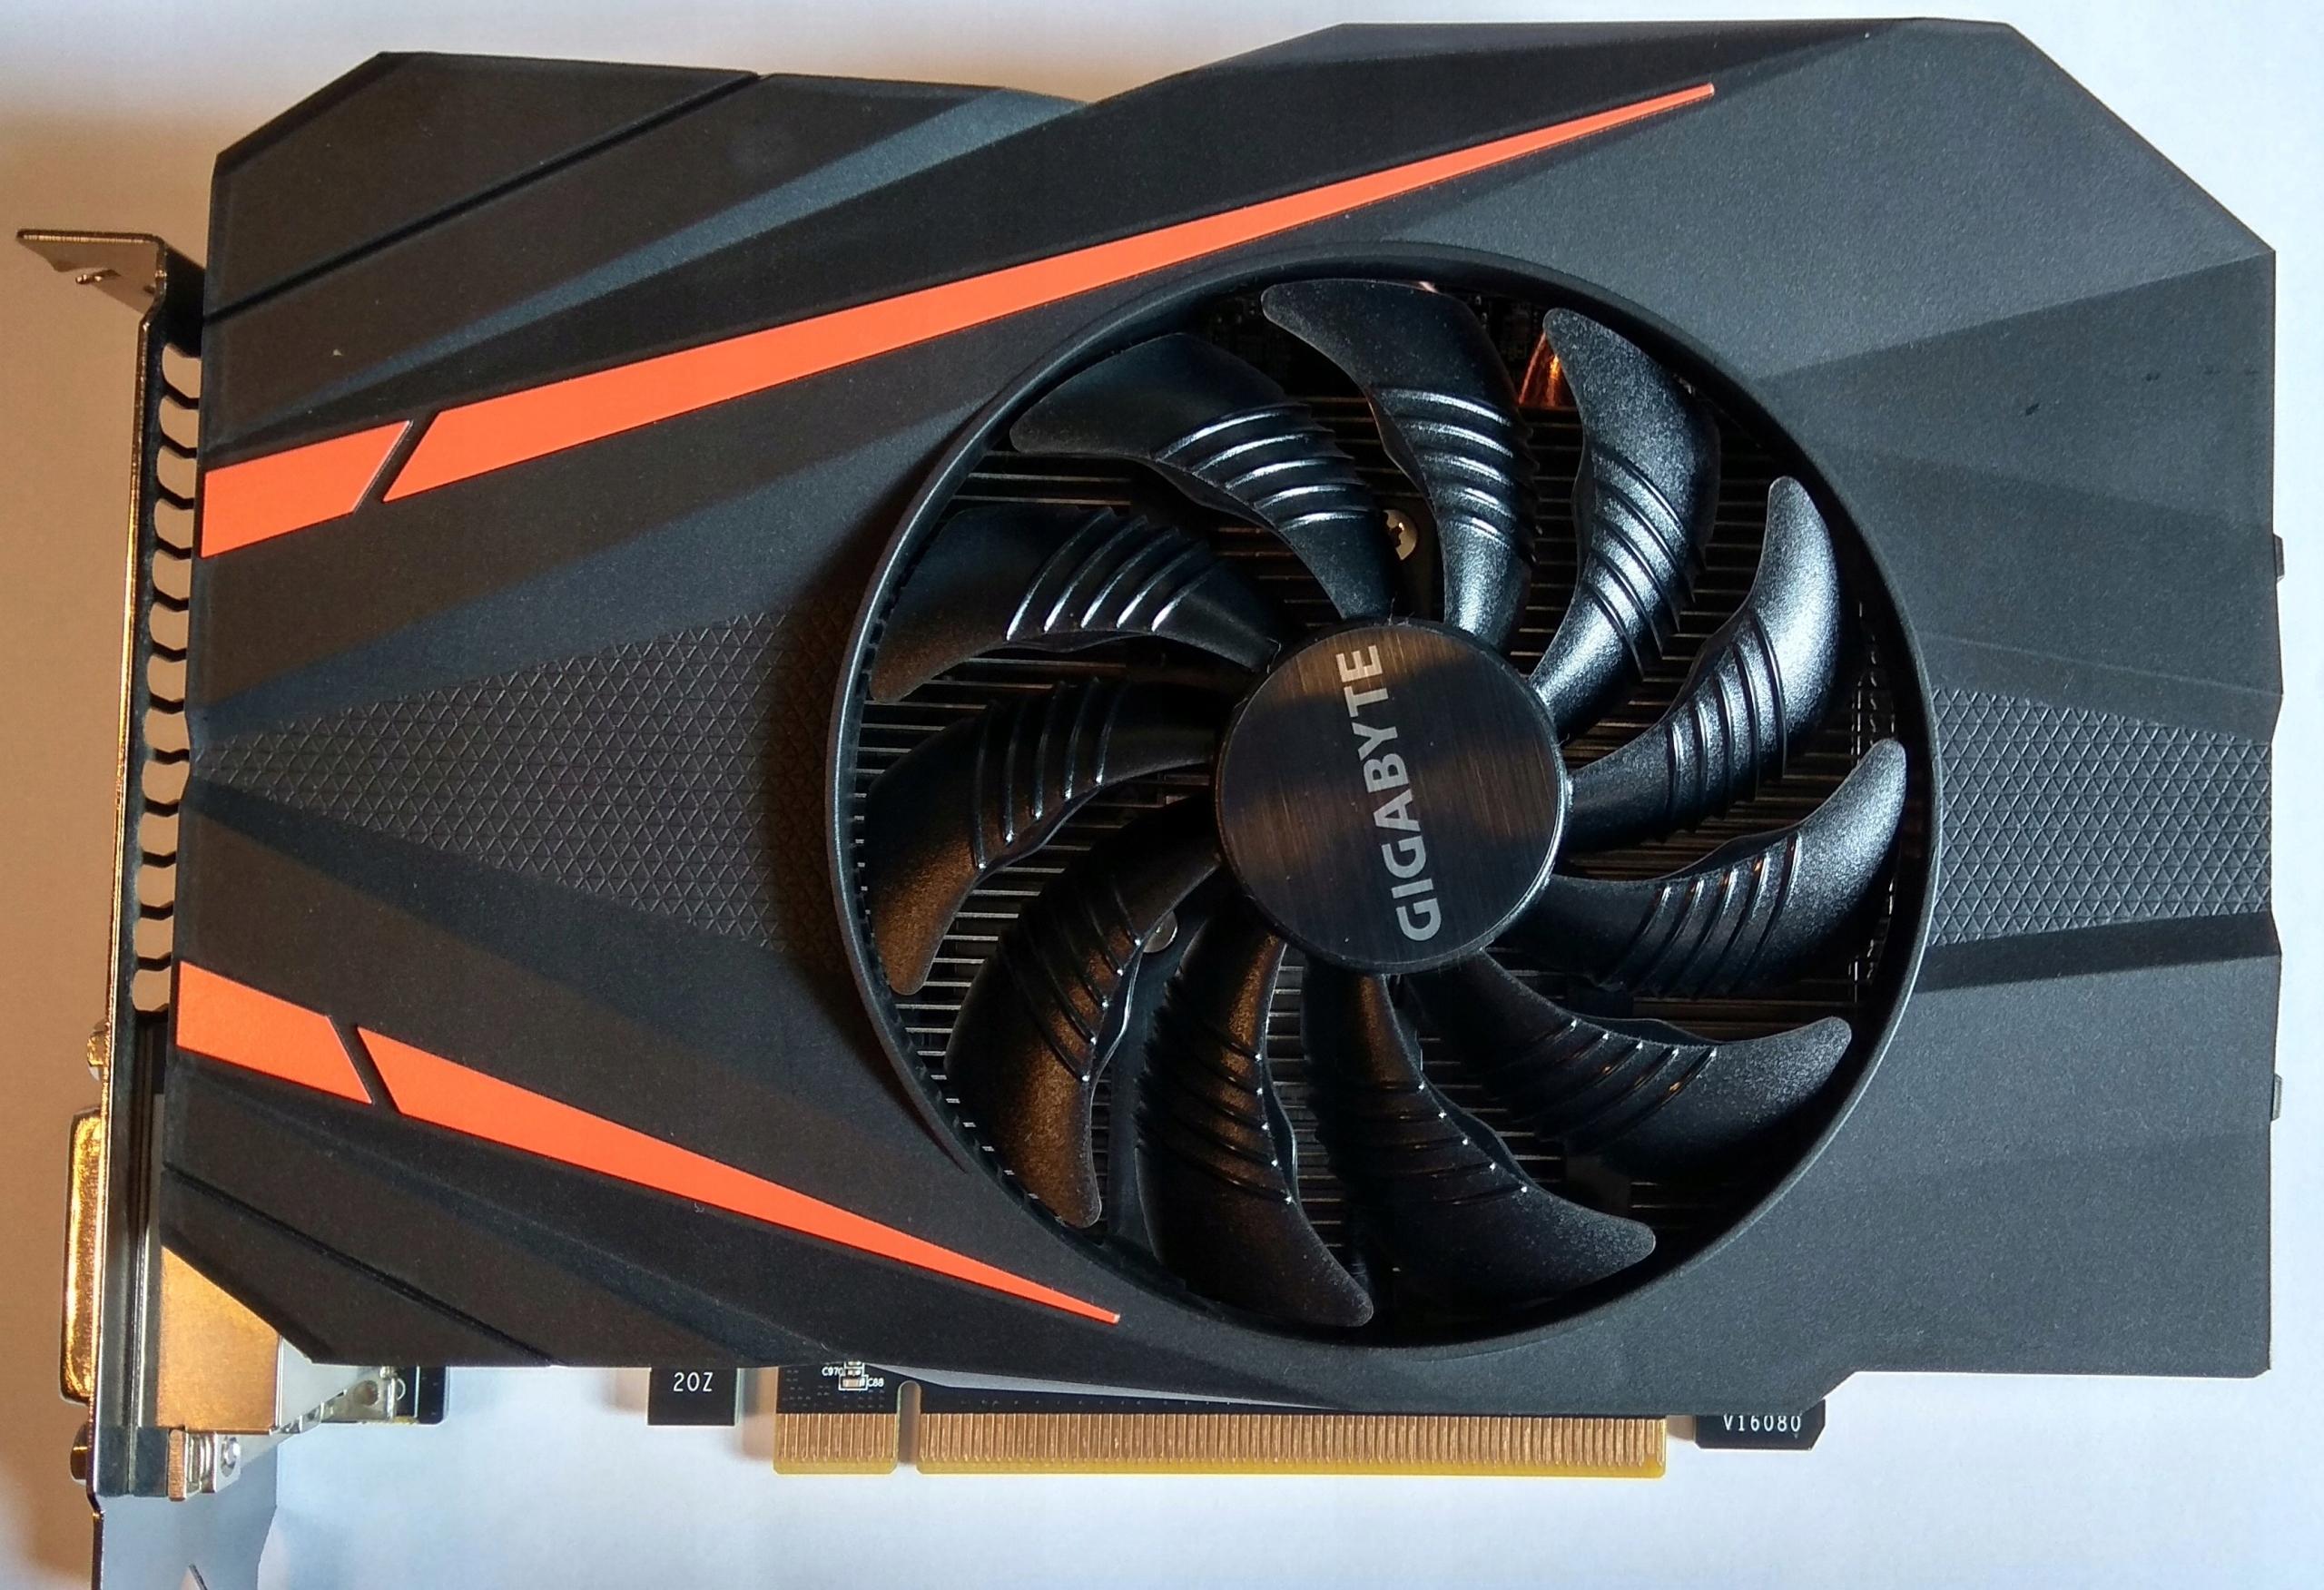 87b9e6df6 Gigabyte GeForce GTX 1060 Mini ITX OC 3GB GDDR5 - 7525207752 ...